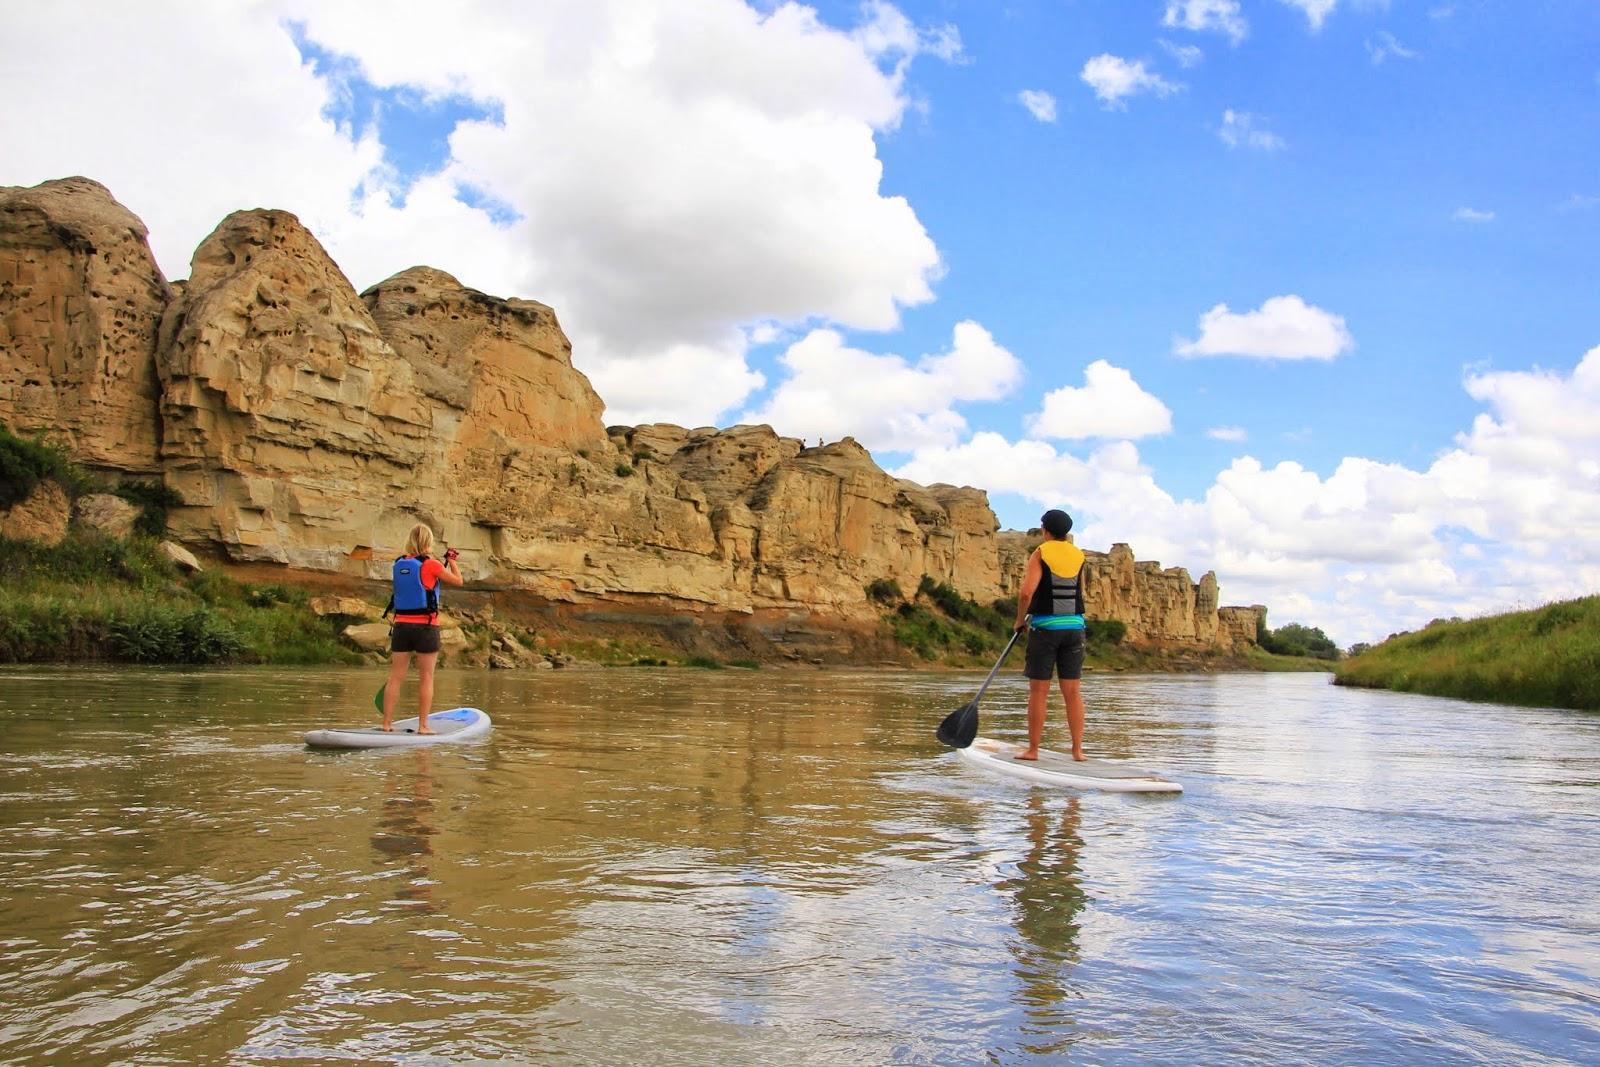 Rockies: The 5 Best Waterside Campgrounds Near Calgary, Alberta